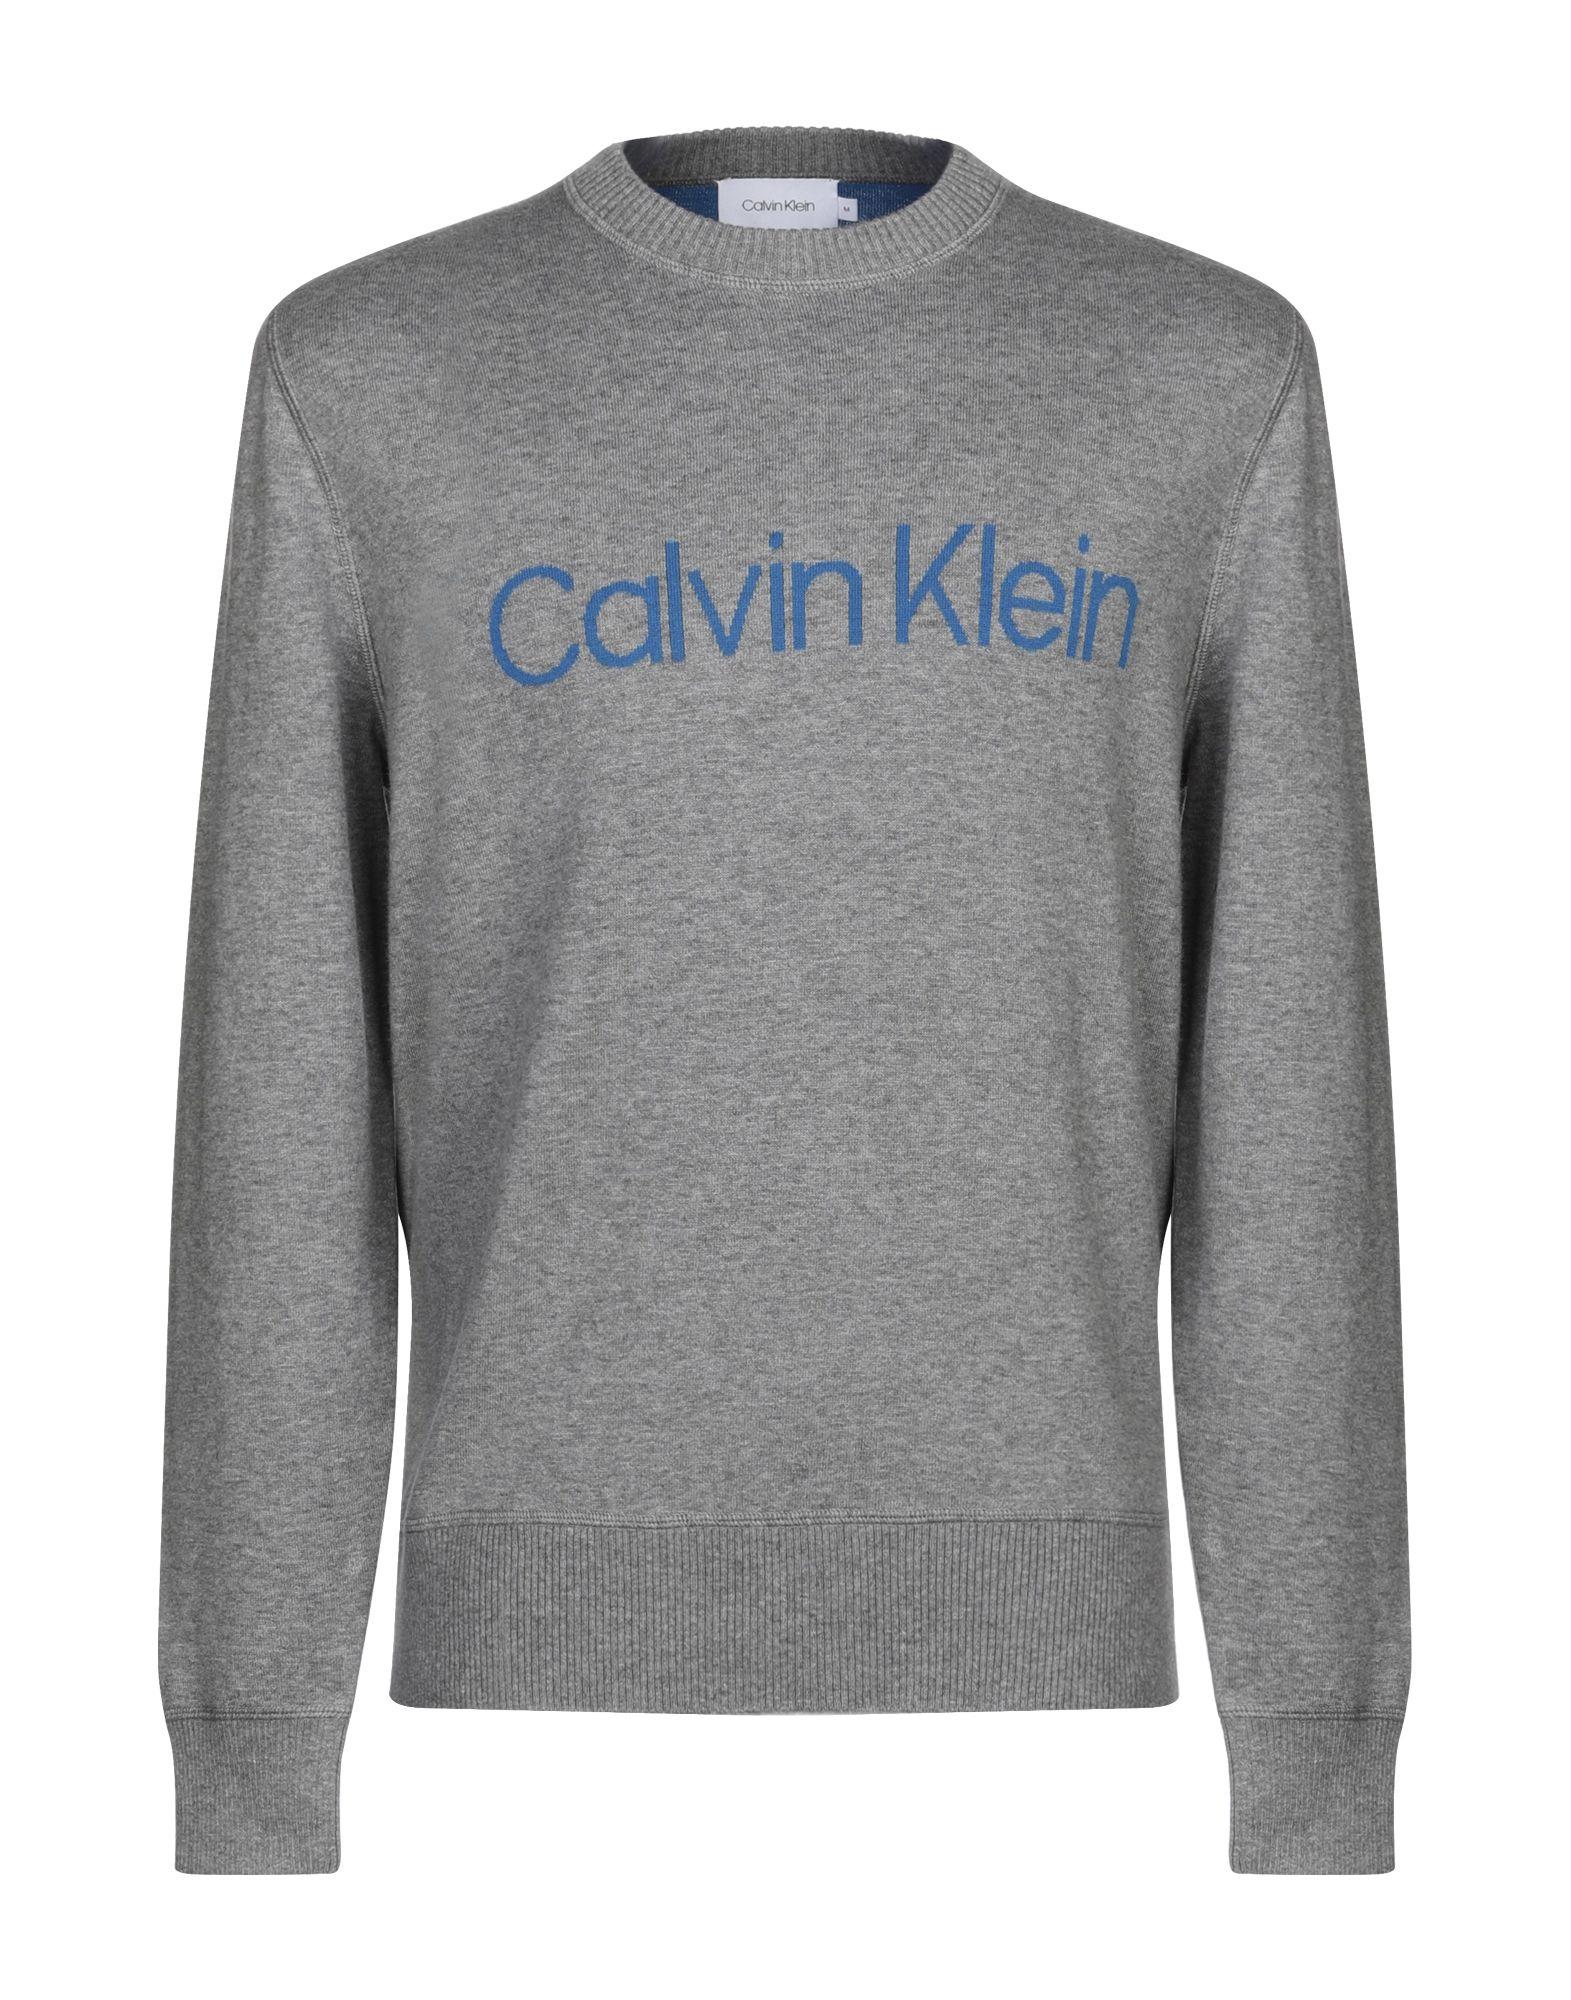 CALVIN KLEIN Свитер цены онлайн